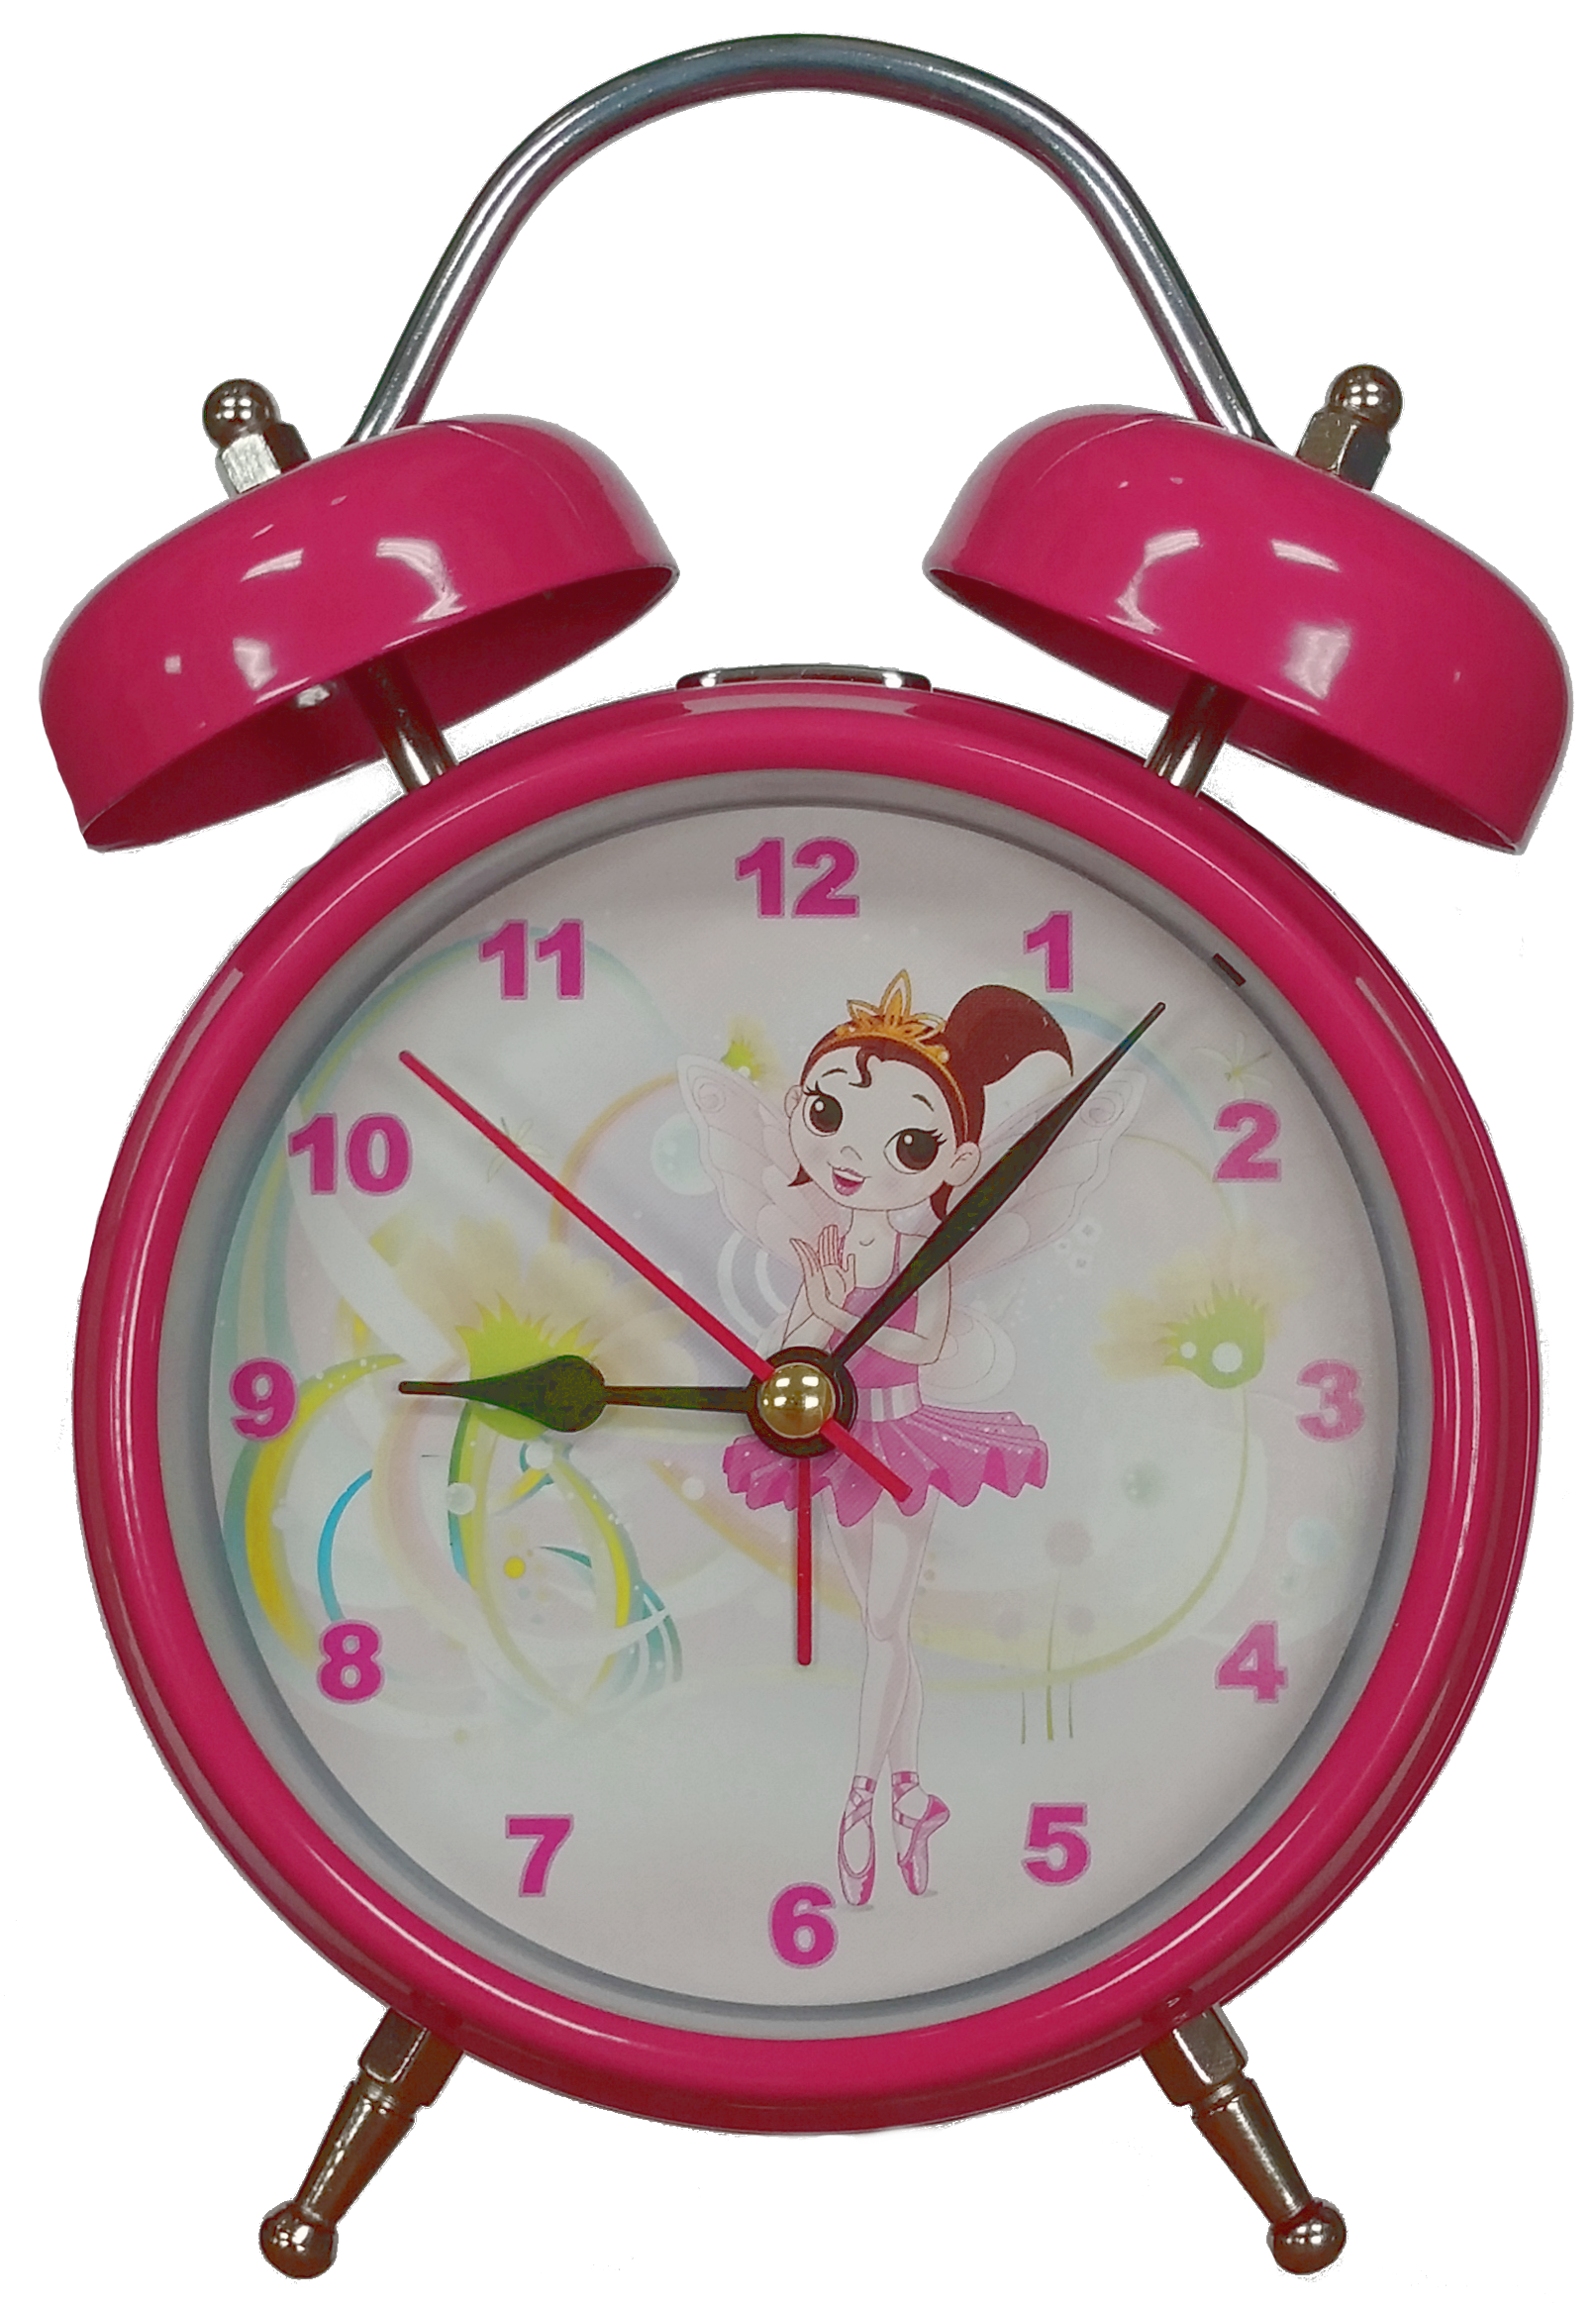 Alarm Clocks Ballerina Alarm Clock Sing Your Name Plays Custom Music Featuring Your Child S Name Unique Alarm Clocks Alarm Clock Clock